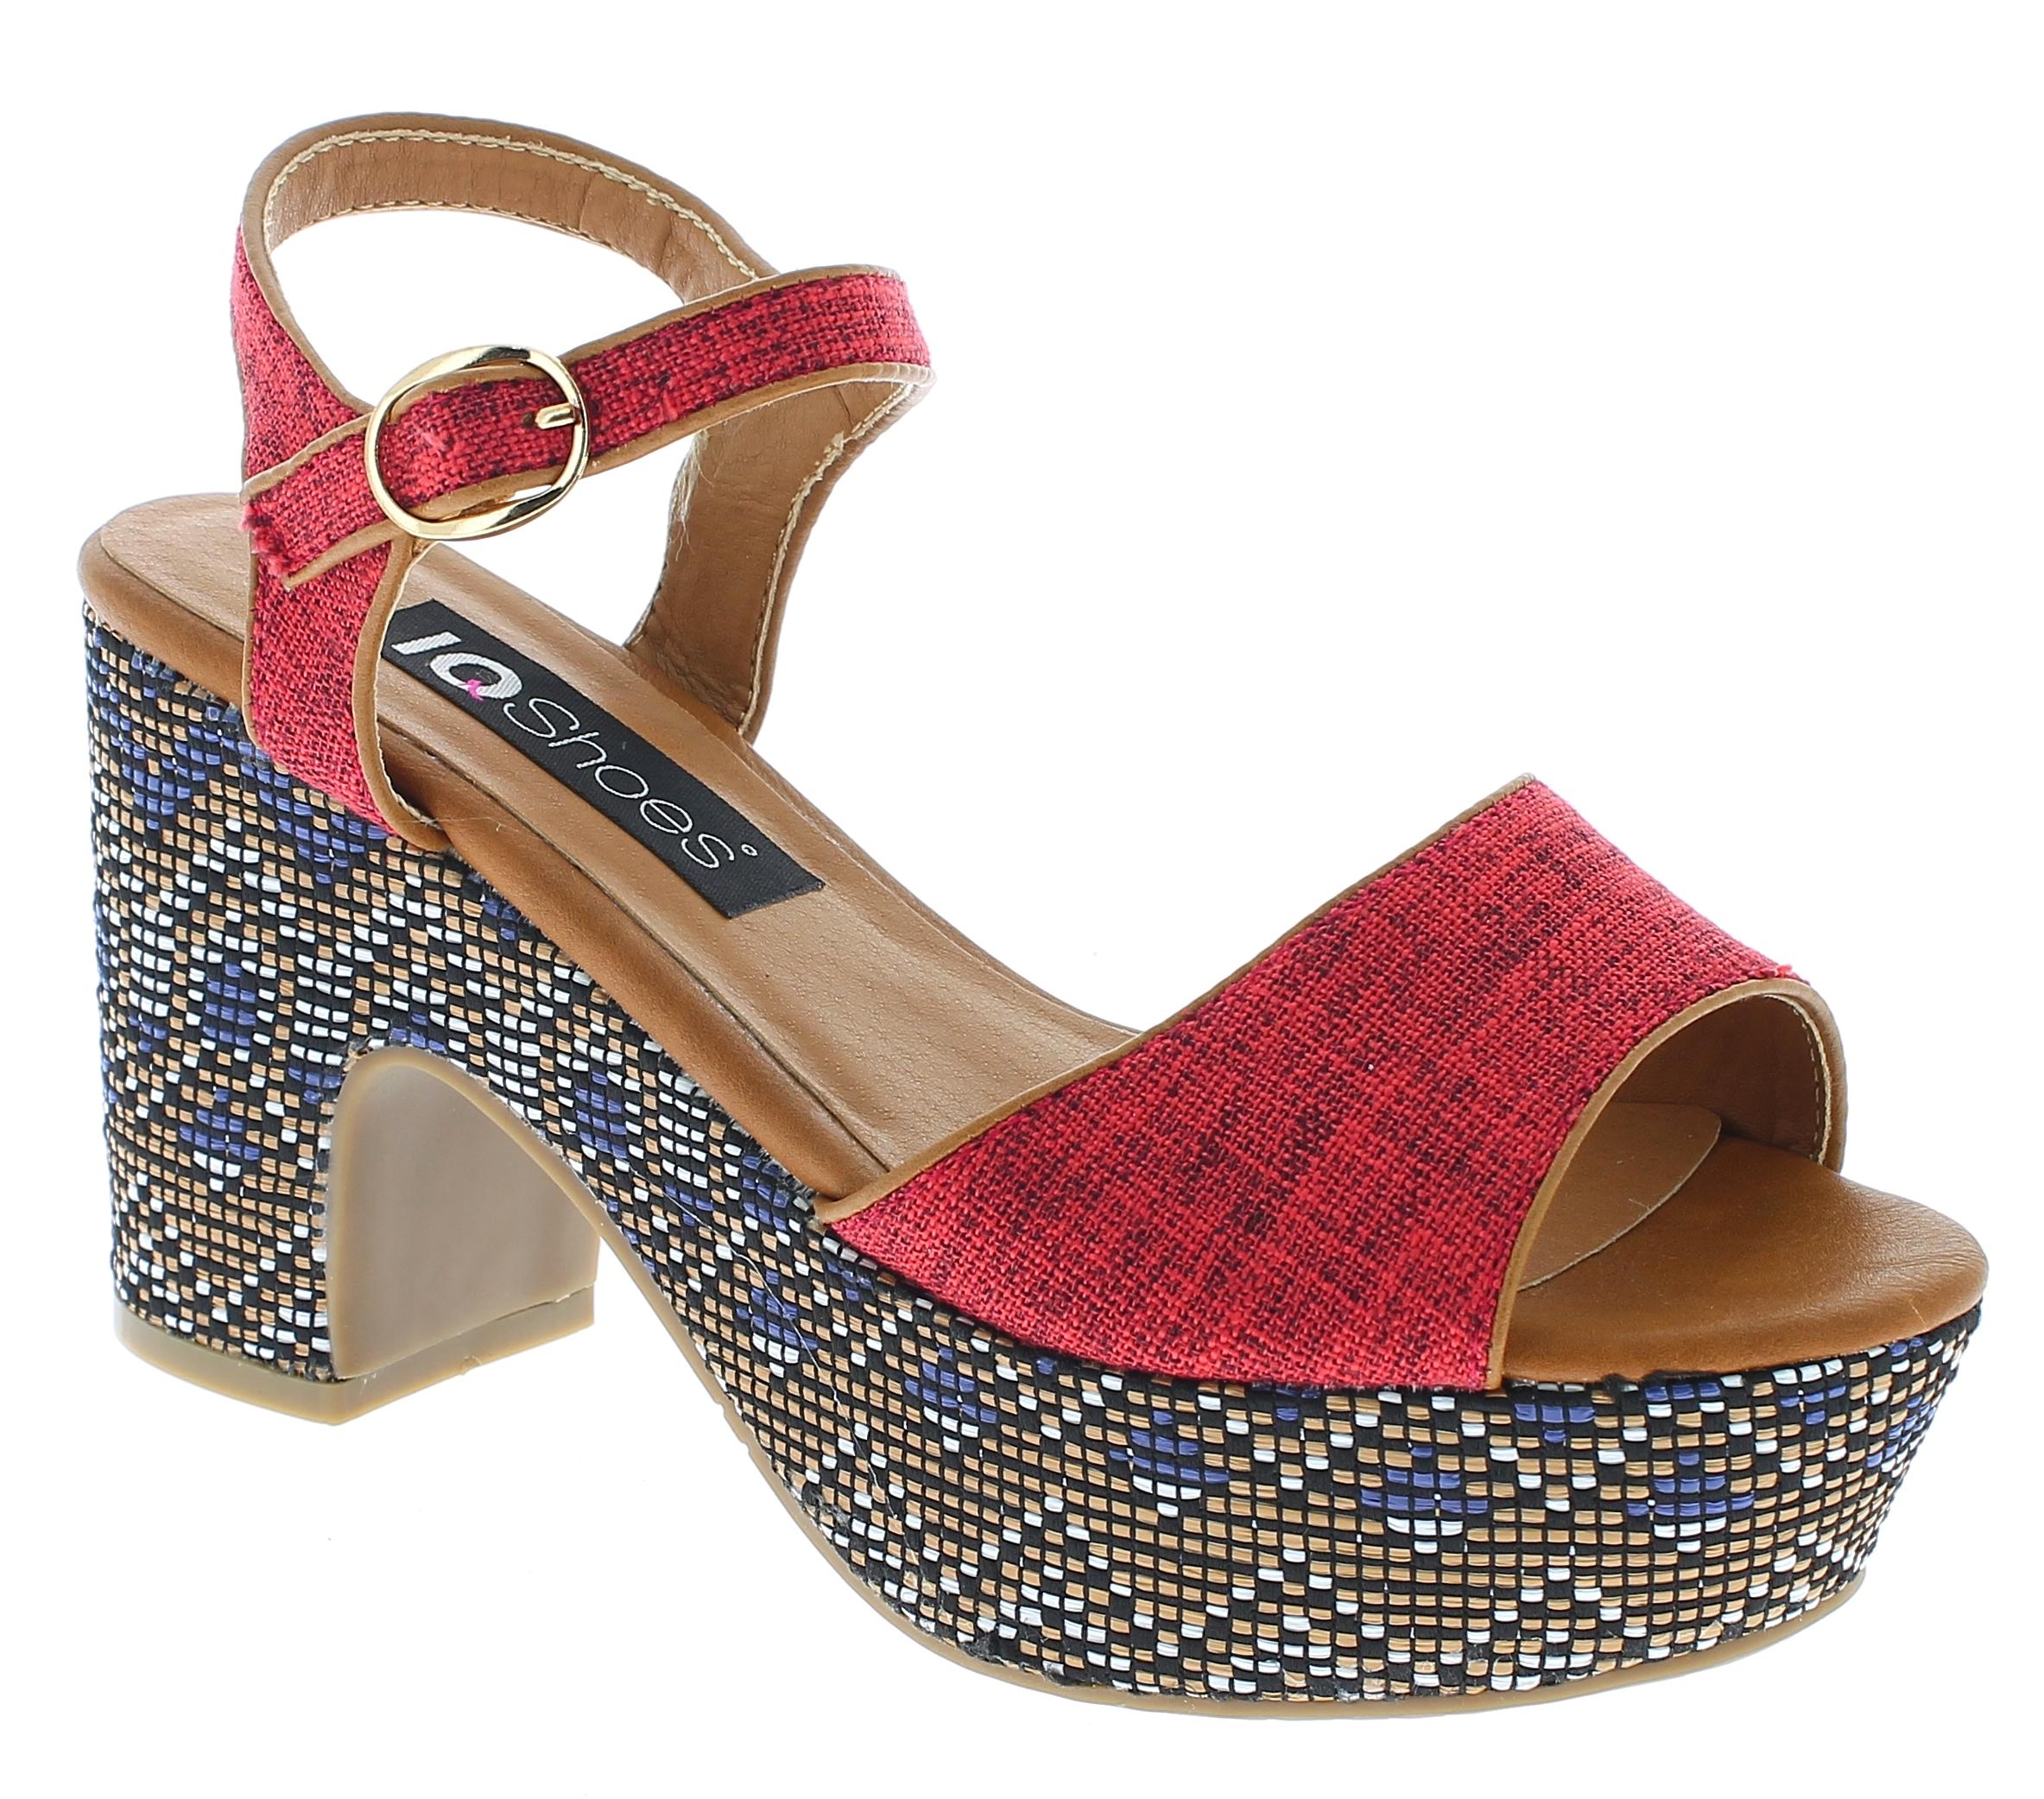 IQSHOES Γυναικείο Πέδιλο 3A361 Κόκκινο - IqShoes - 3A361 RED-red-35/1/3/29 παπούτσια  πέδιλα